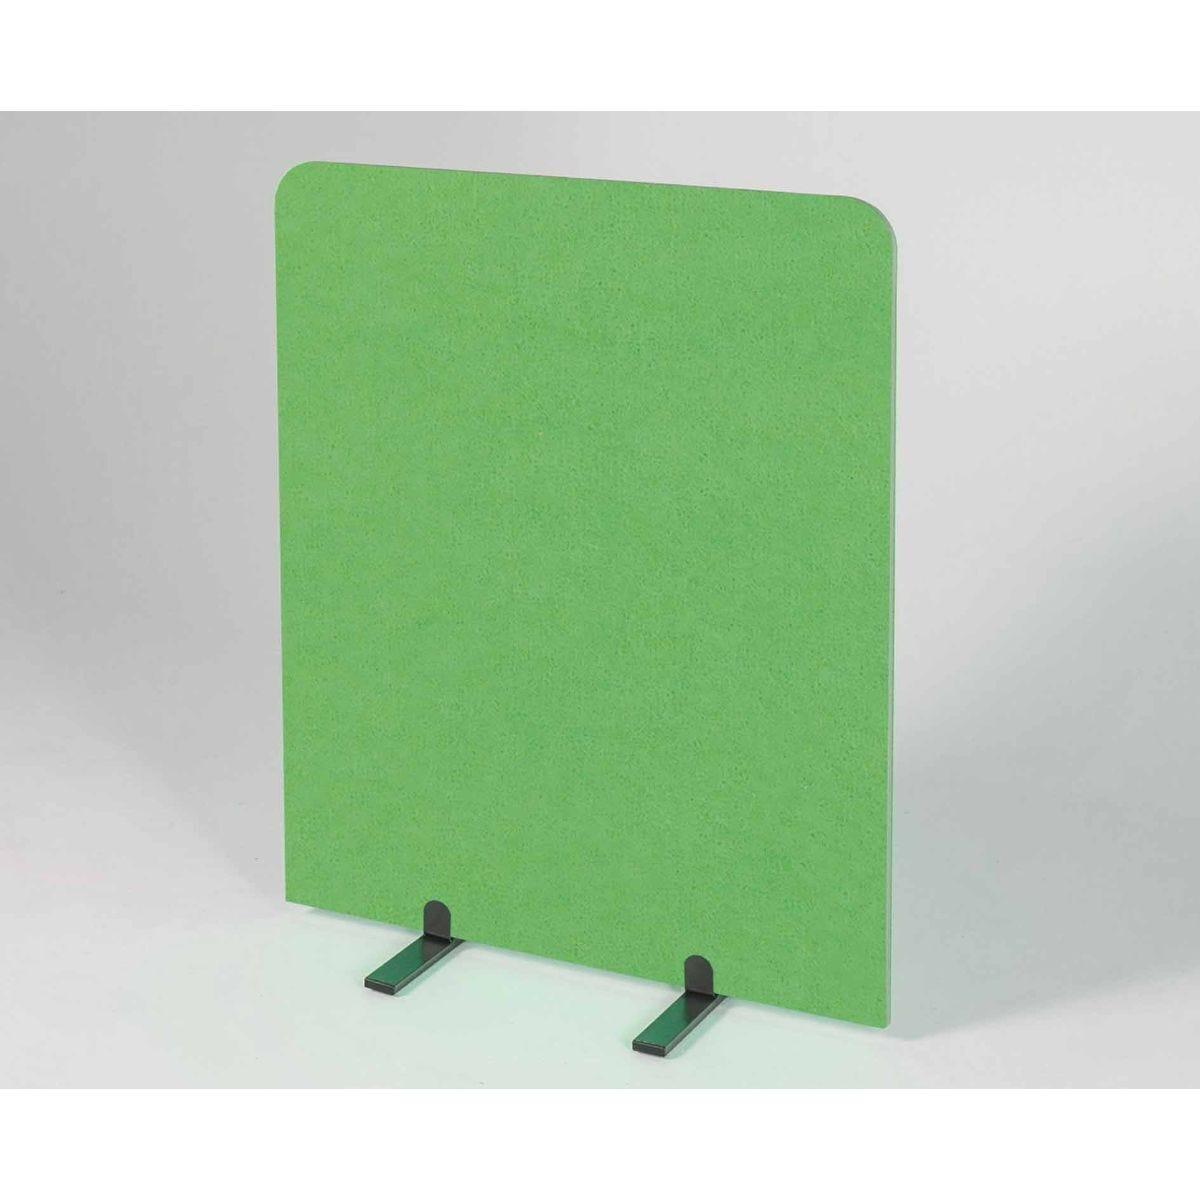 Metroplan BusyScreen Curve Screen 1200 x 1200mm Apple Green